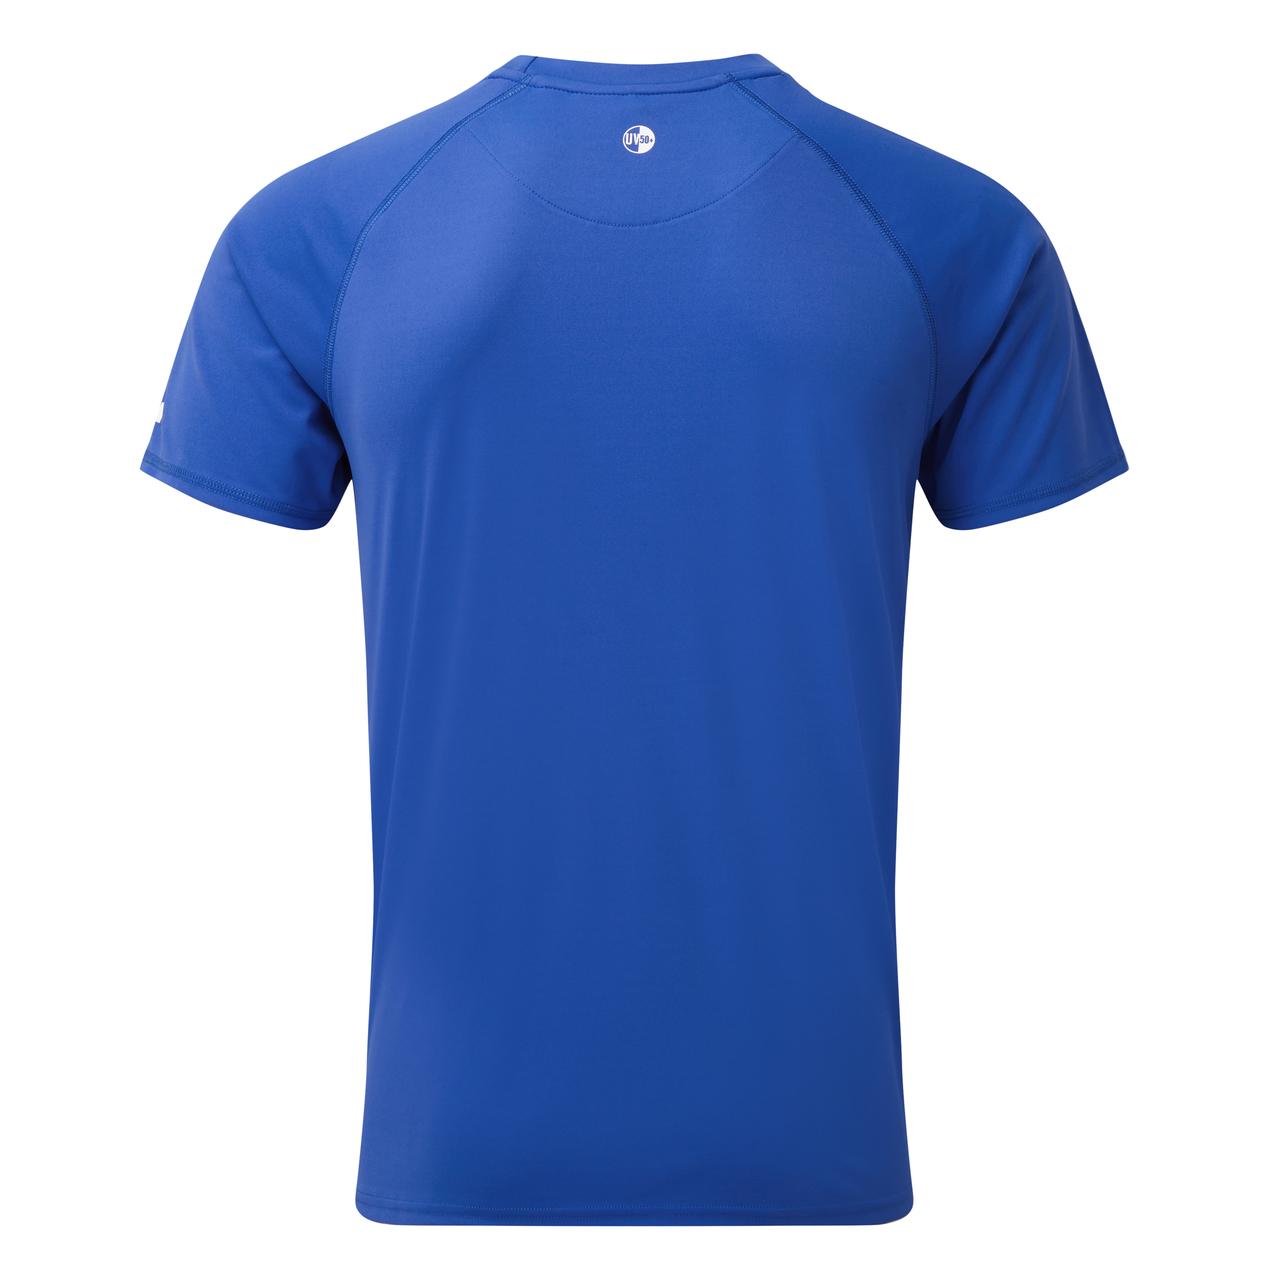 Men's UV Tec Tee - UV010-BLU01-3.jpg